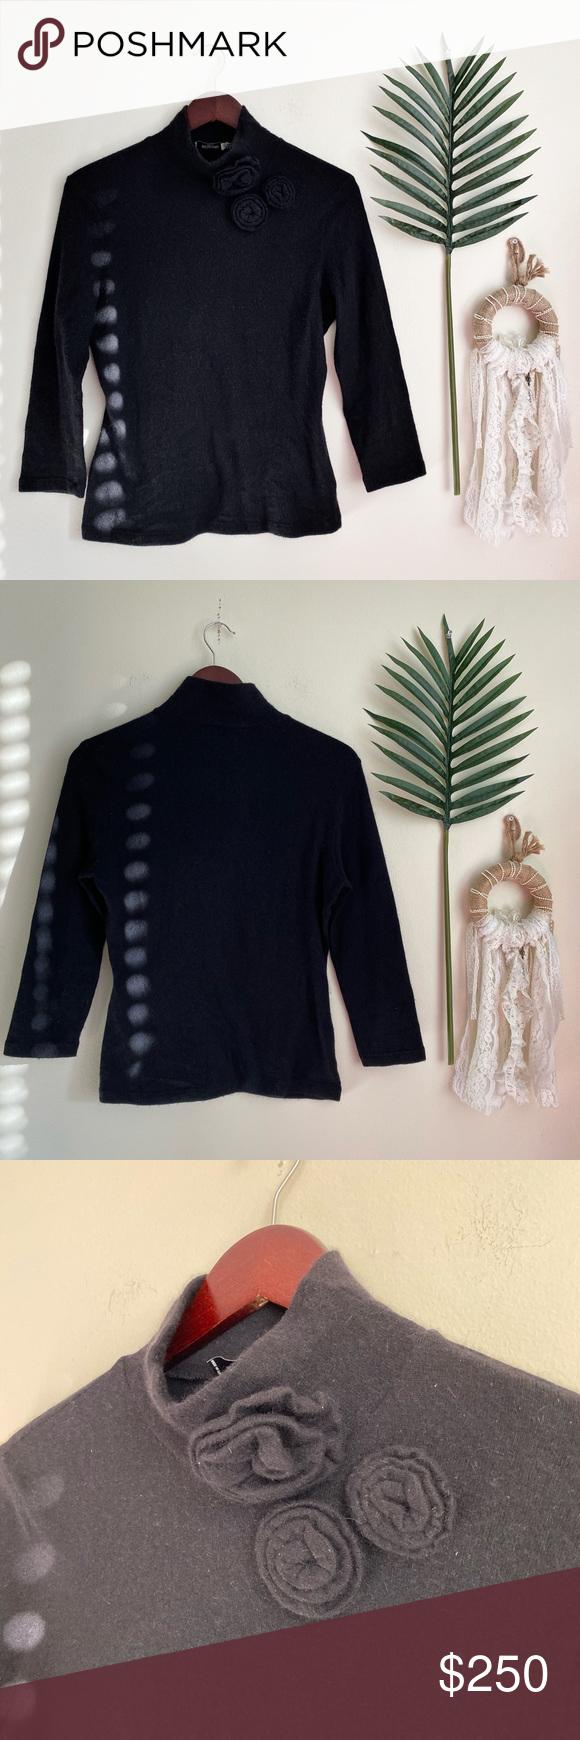 Moschino Jeans Black Turtleneck Sweater Floral Super cute black turtleneck pullo…